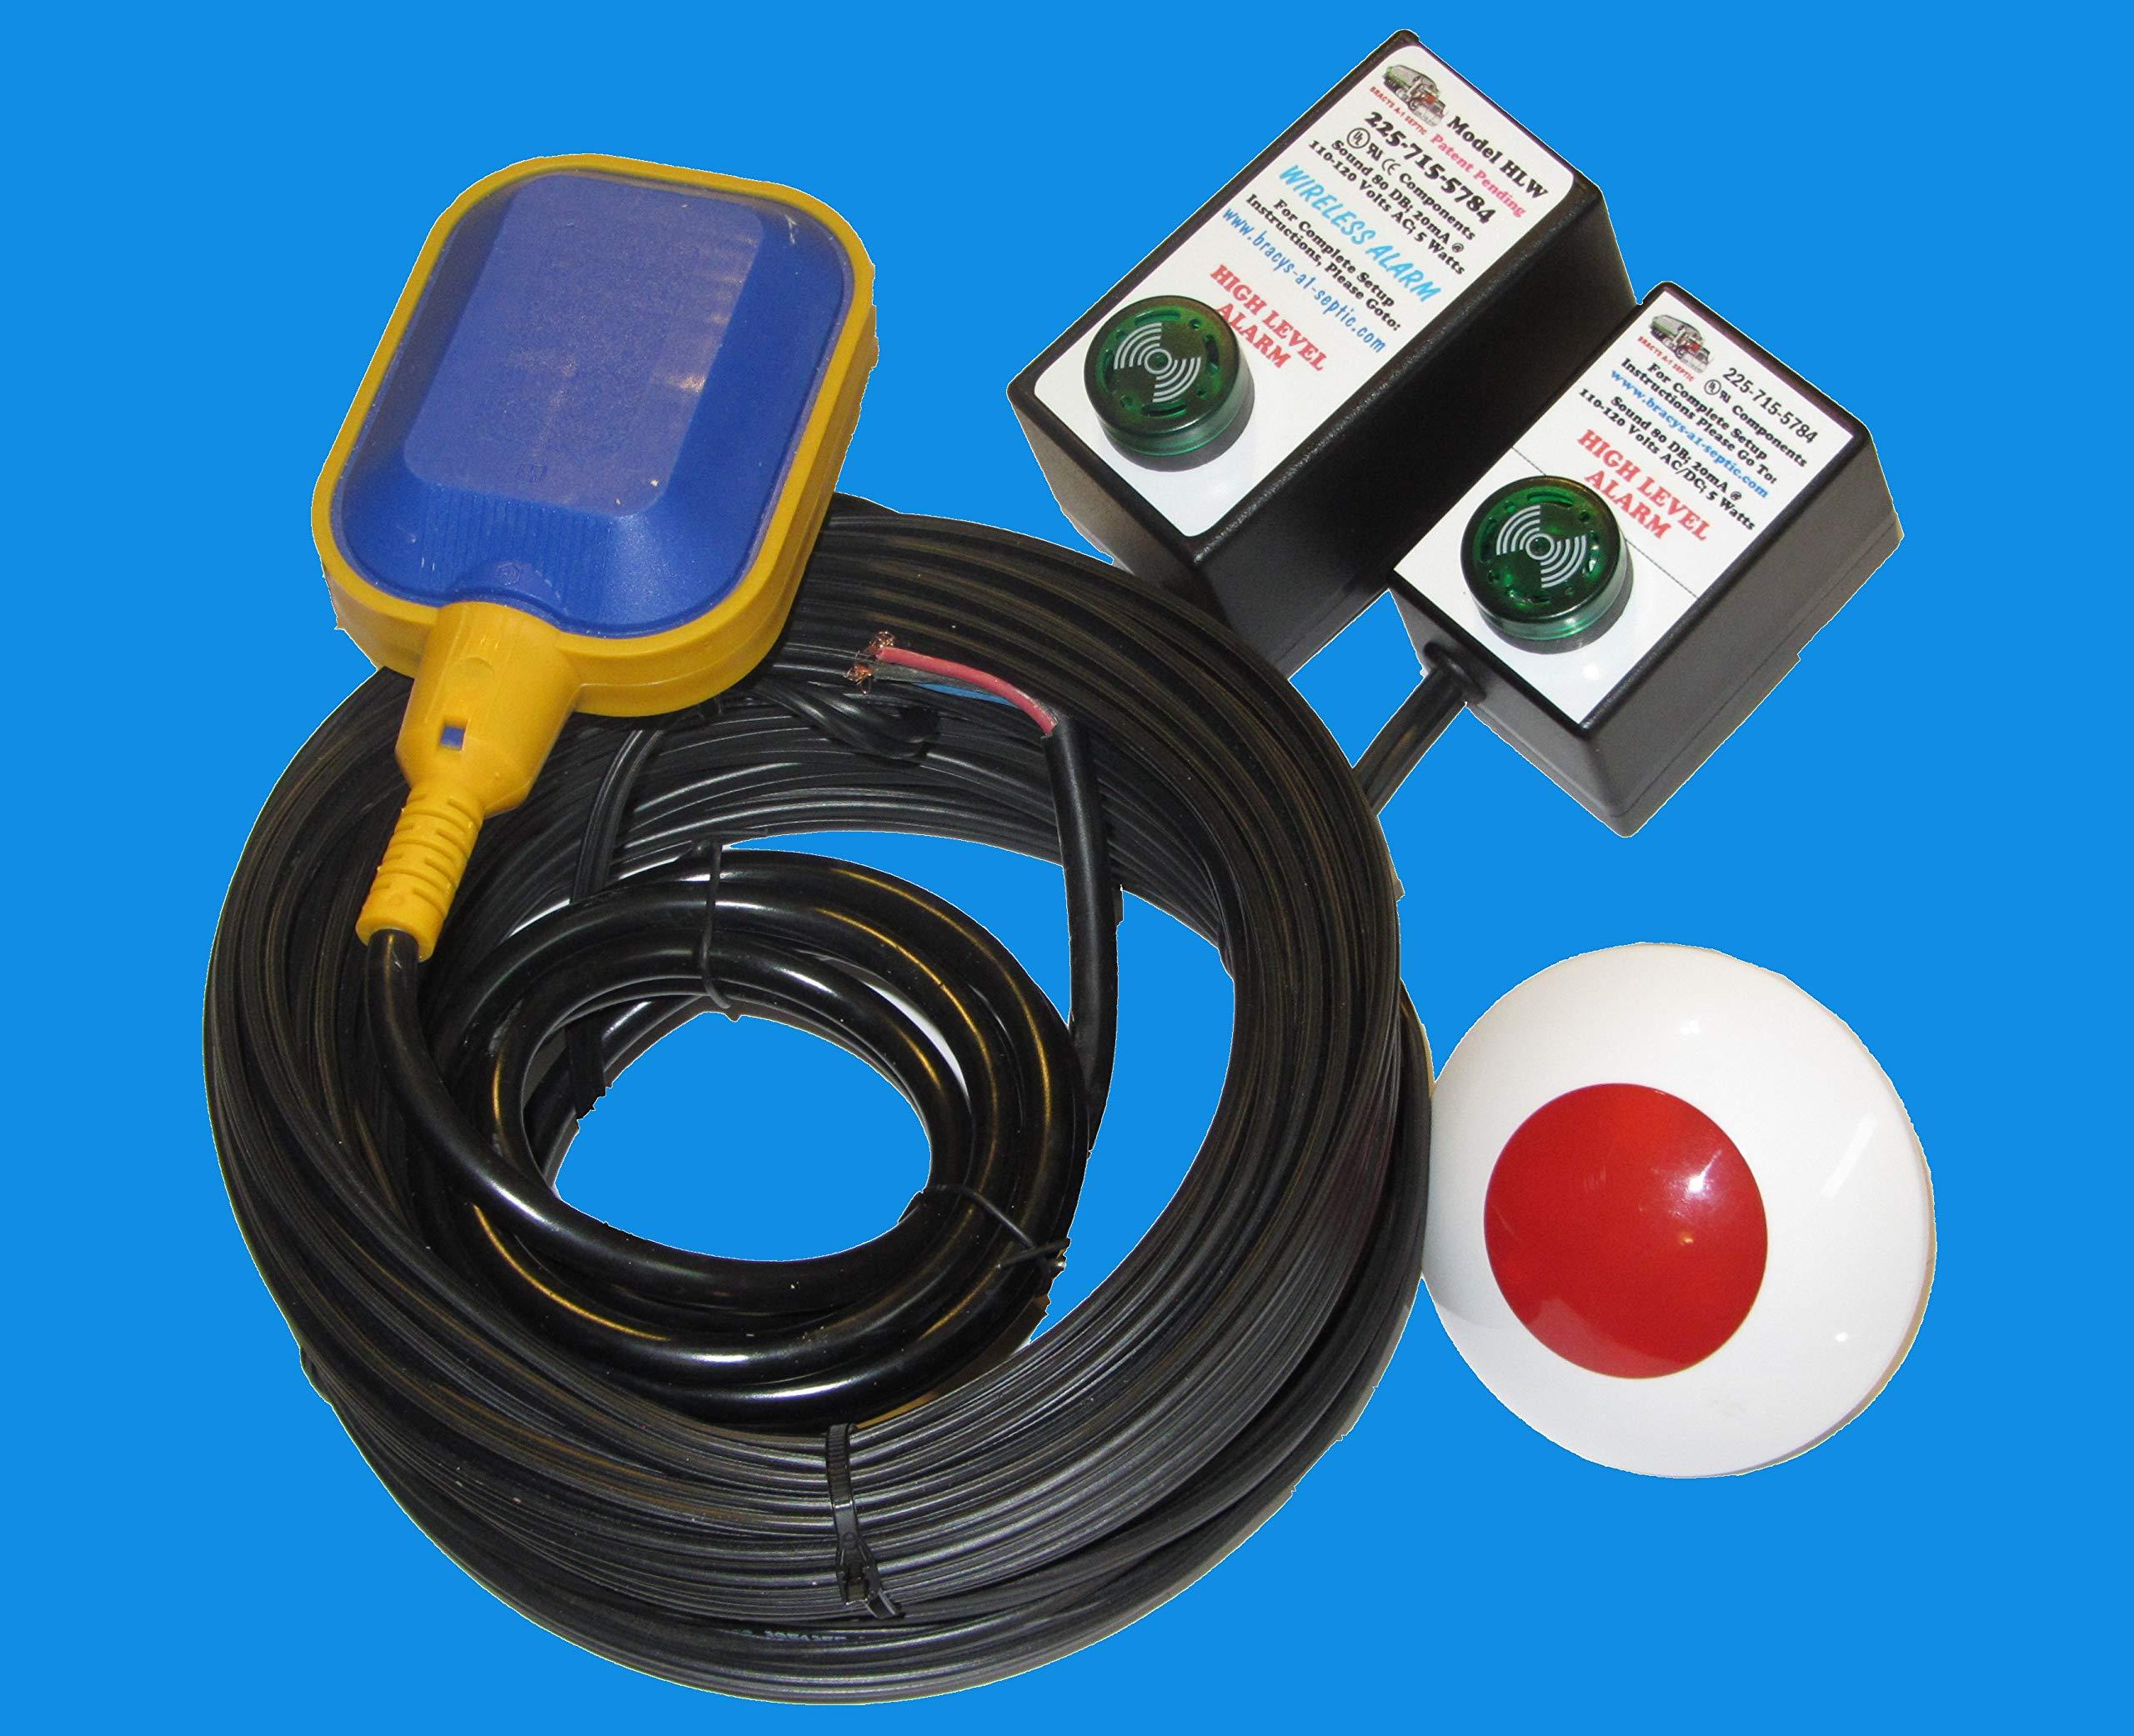 (New Listing) Hi Water Level/Sump Pump Failure Alarm (Standard & Wireless) by Bracys A-1 Septic (Image #1)